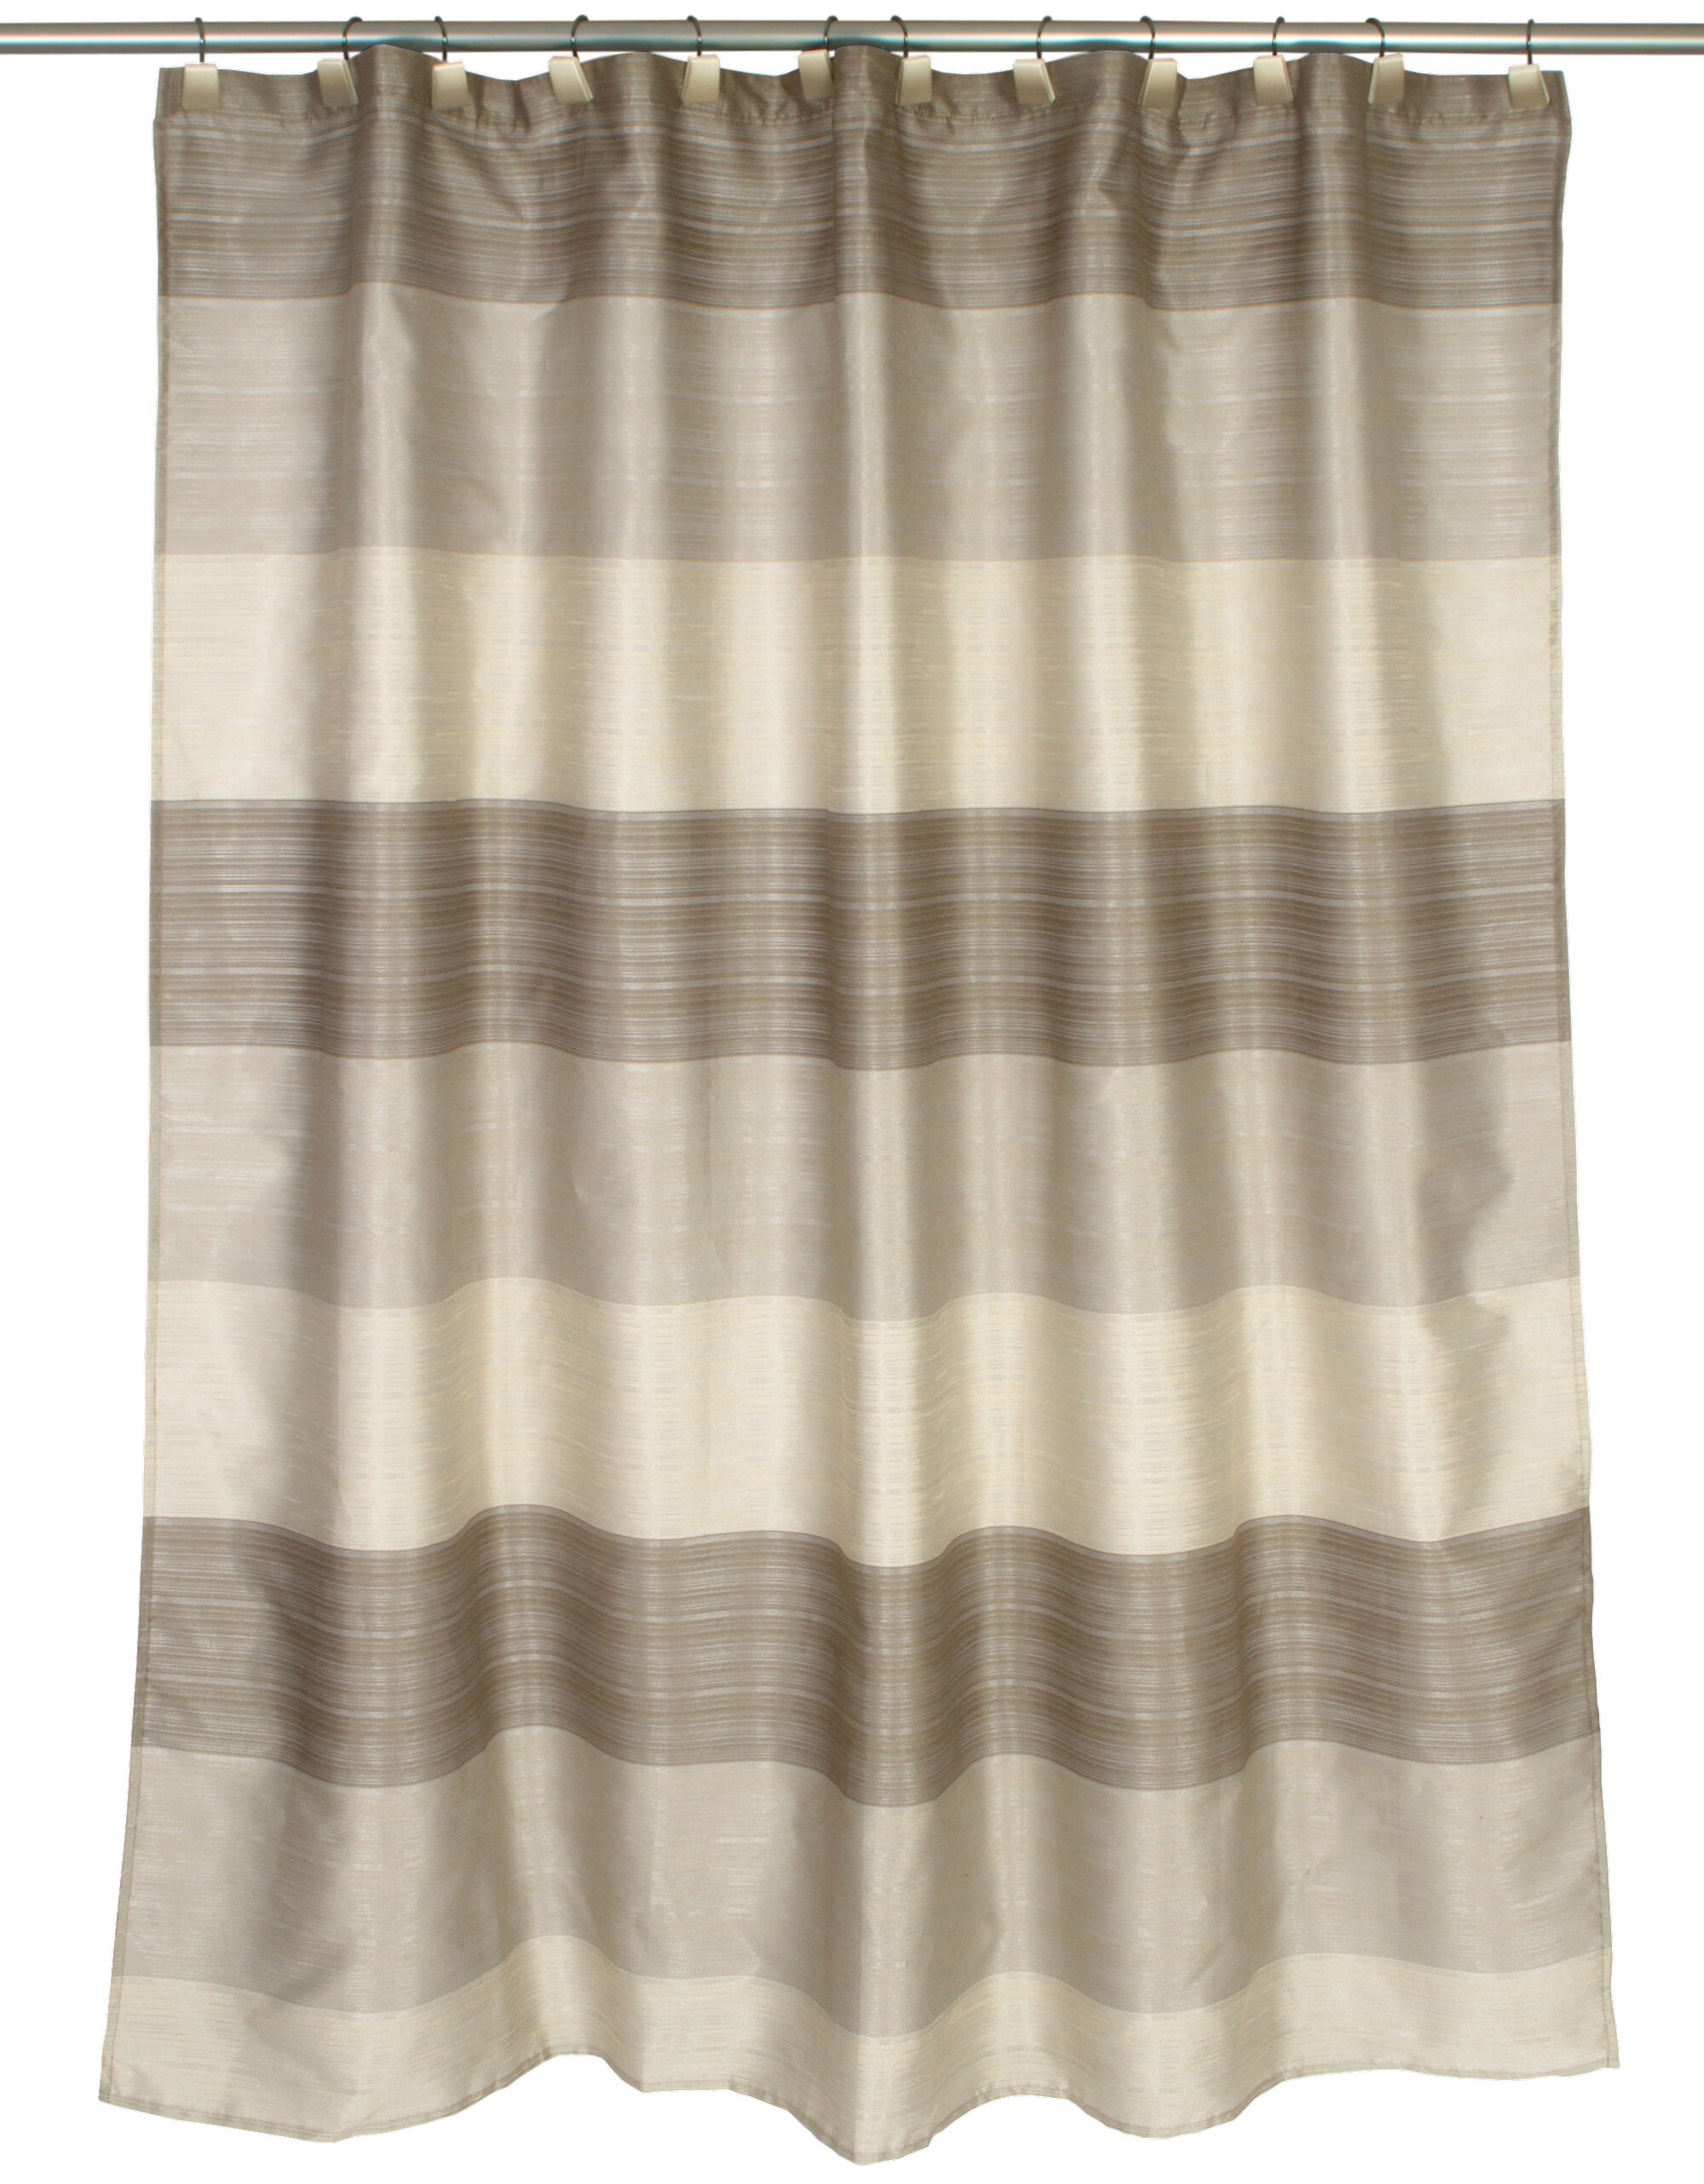 Darby Home Co Ambudkar Shower Curtain